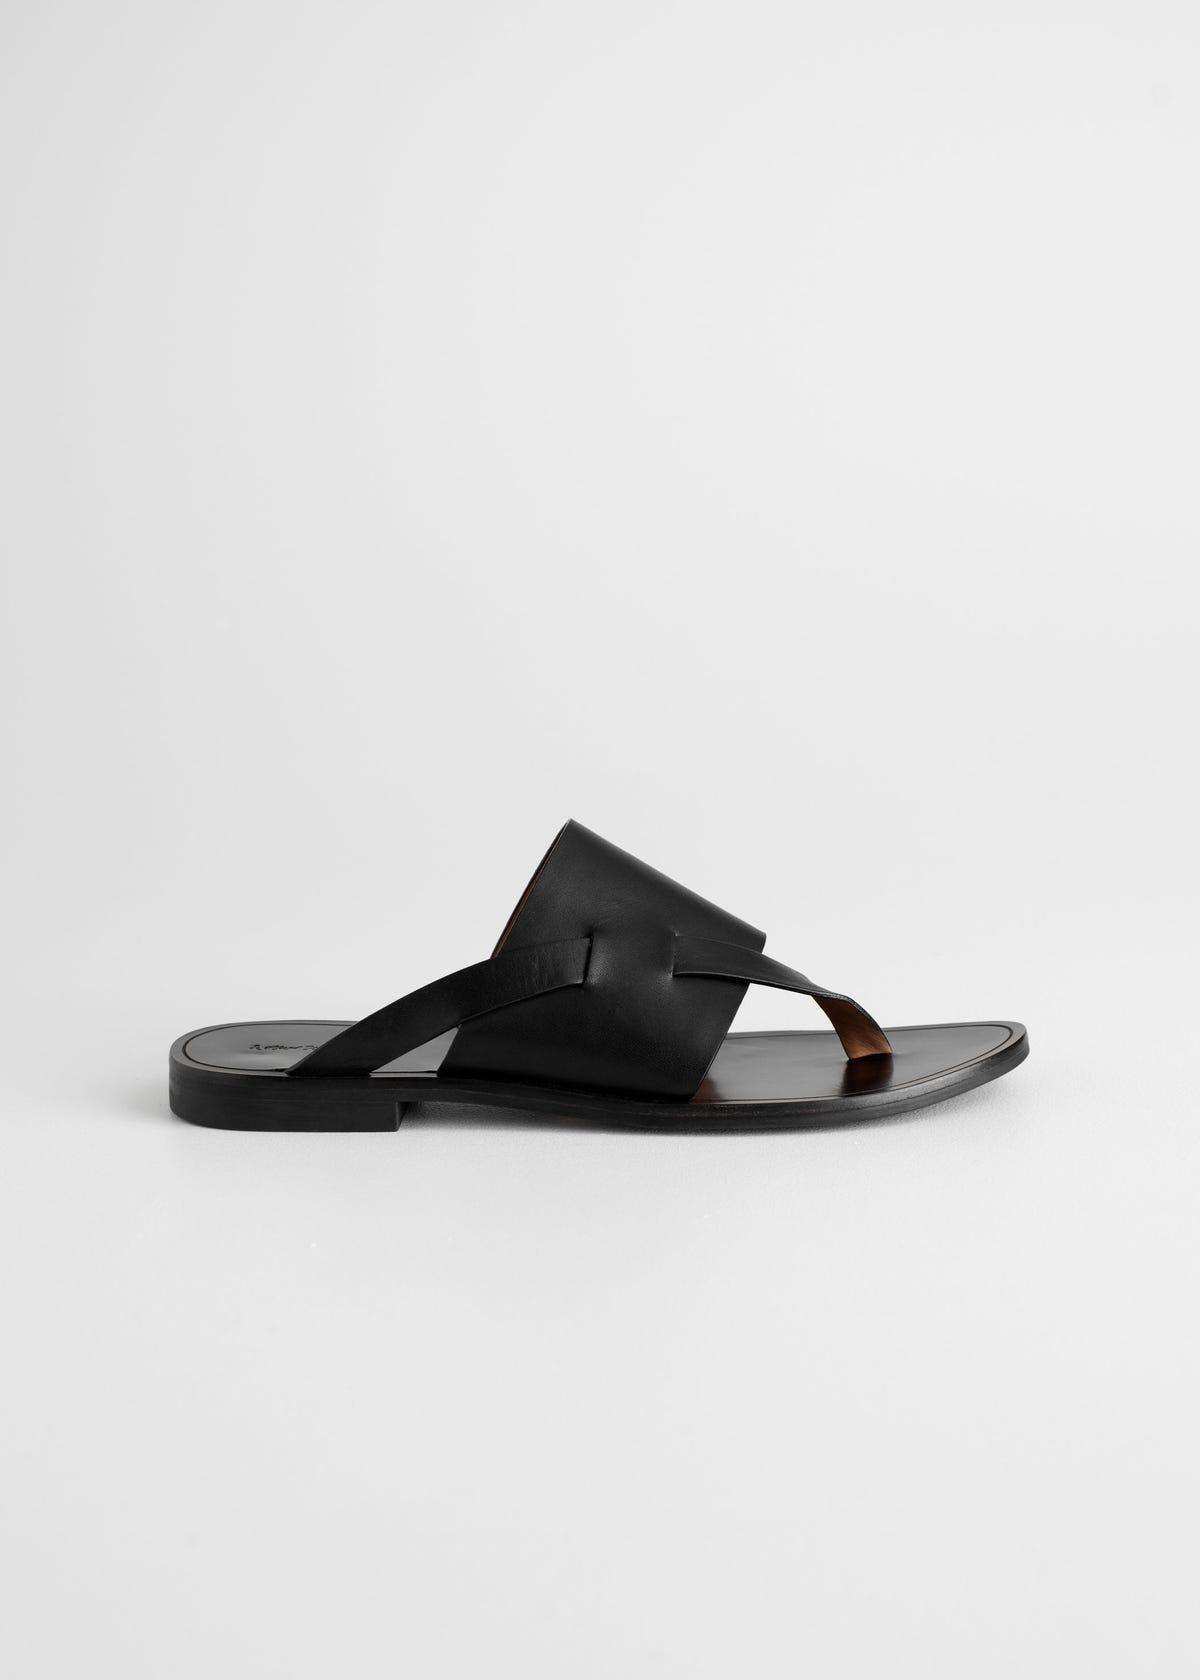 2019 Uk Trend Flat Summer Best Sandals 1TKculJ3F5